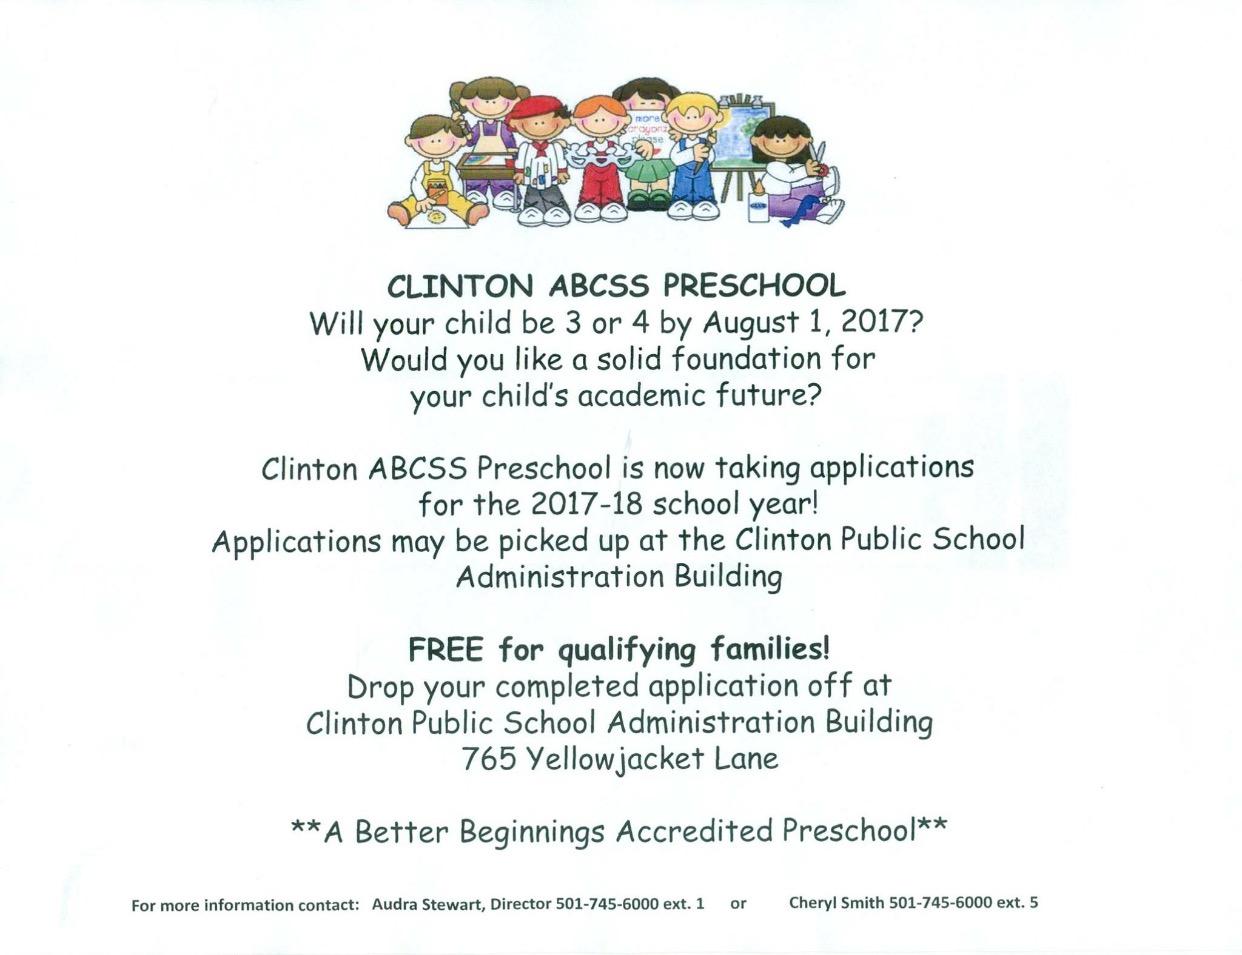 Clinton+ABCSS+Preschool+Enrolling+Now